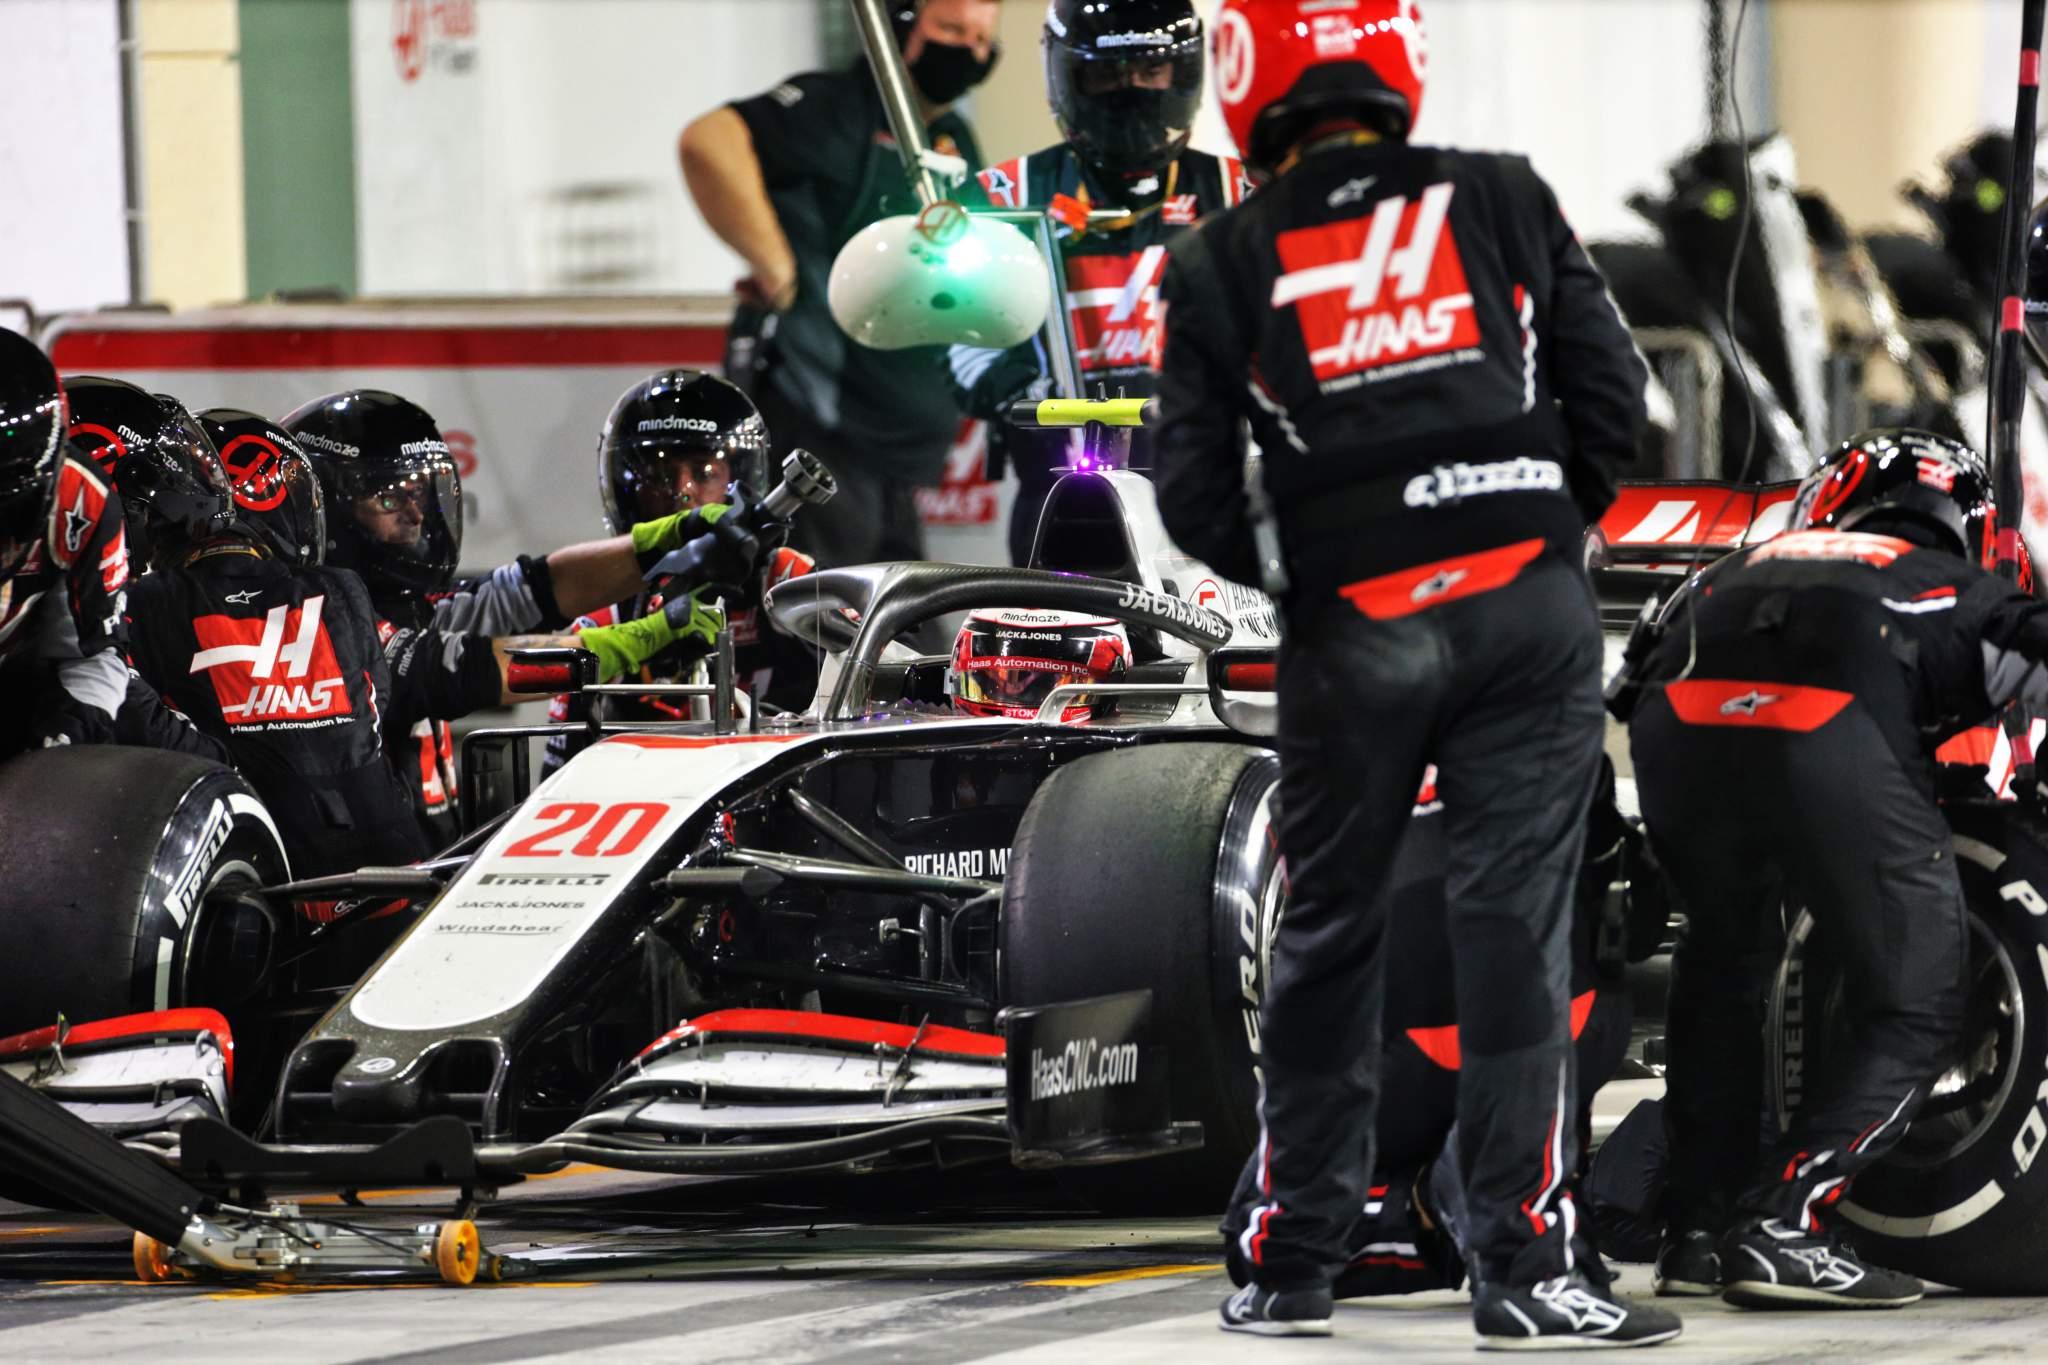 Motor Racing Formula One World Championship Bahrain Grand Prix Race Day Sakhir, Bahrain